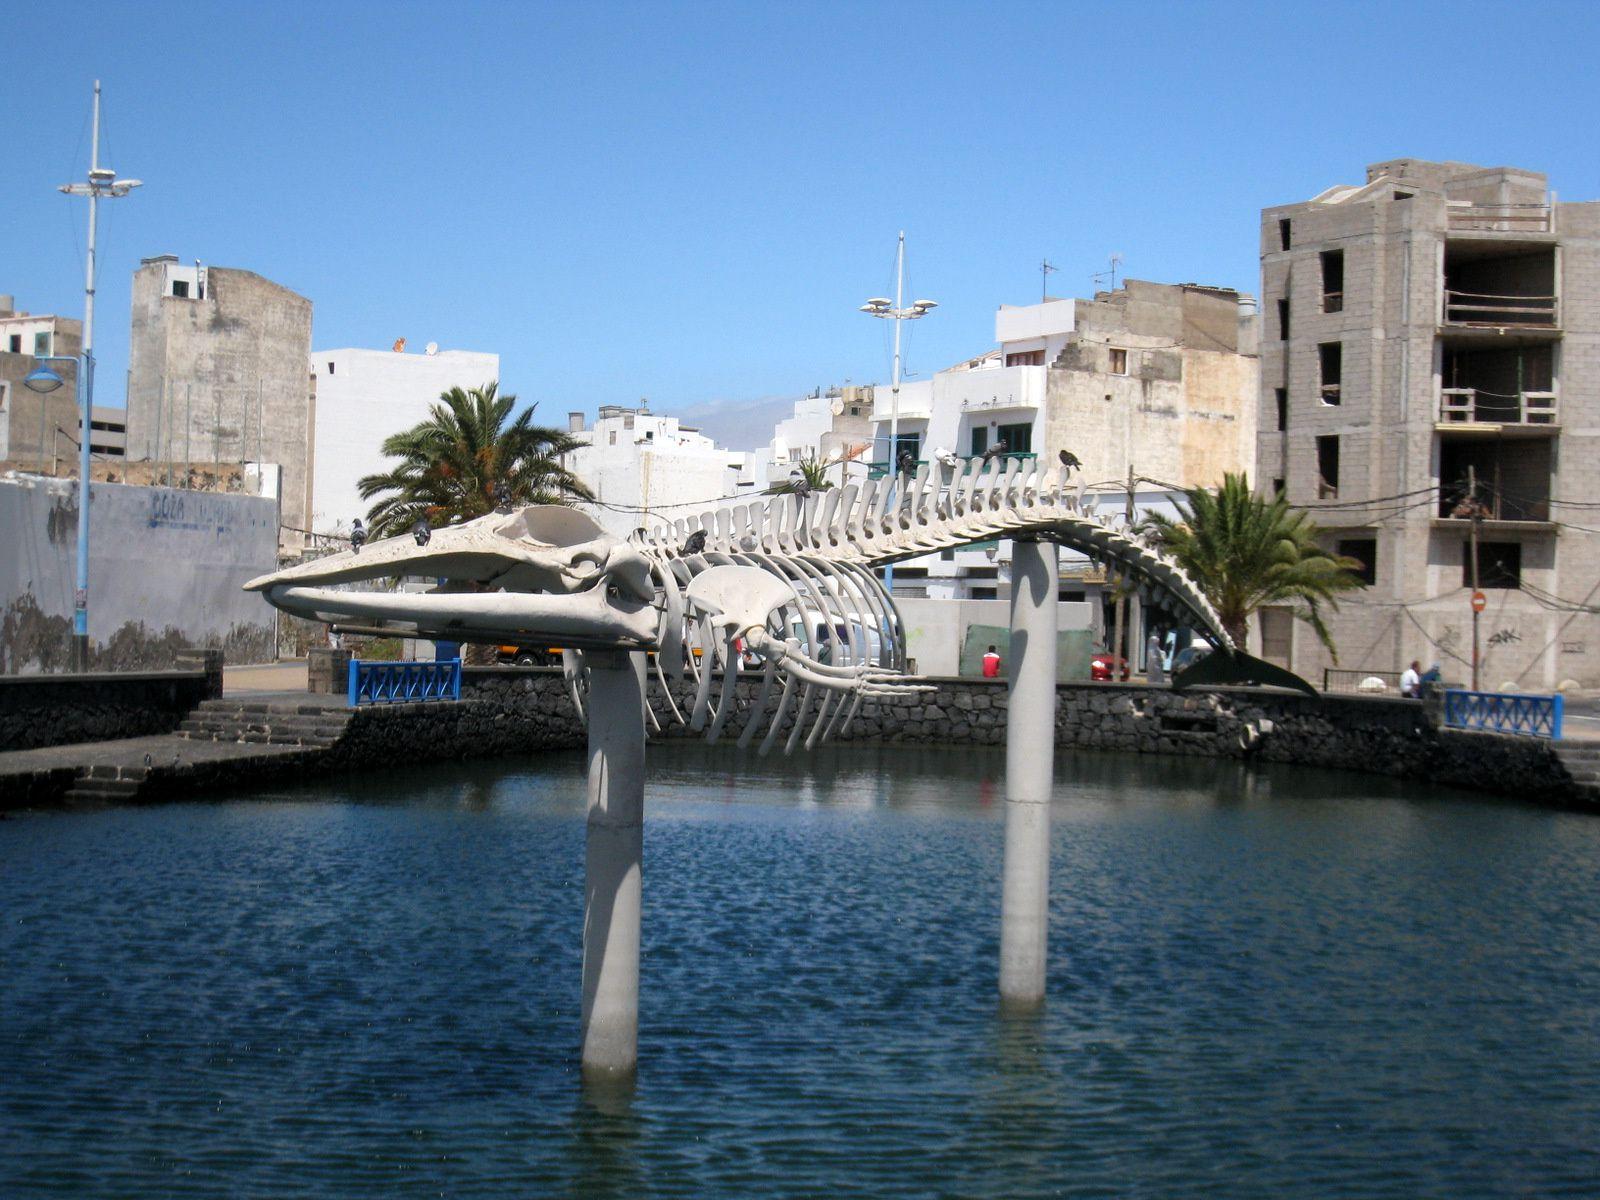 Sculptures à Arrecife (île de Lanzarote), 2/3